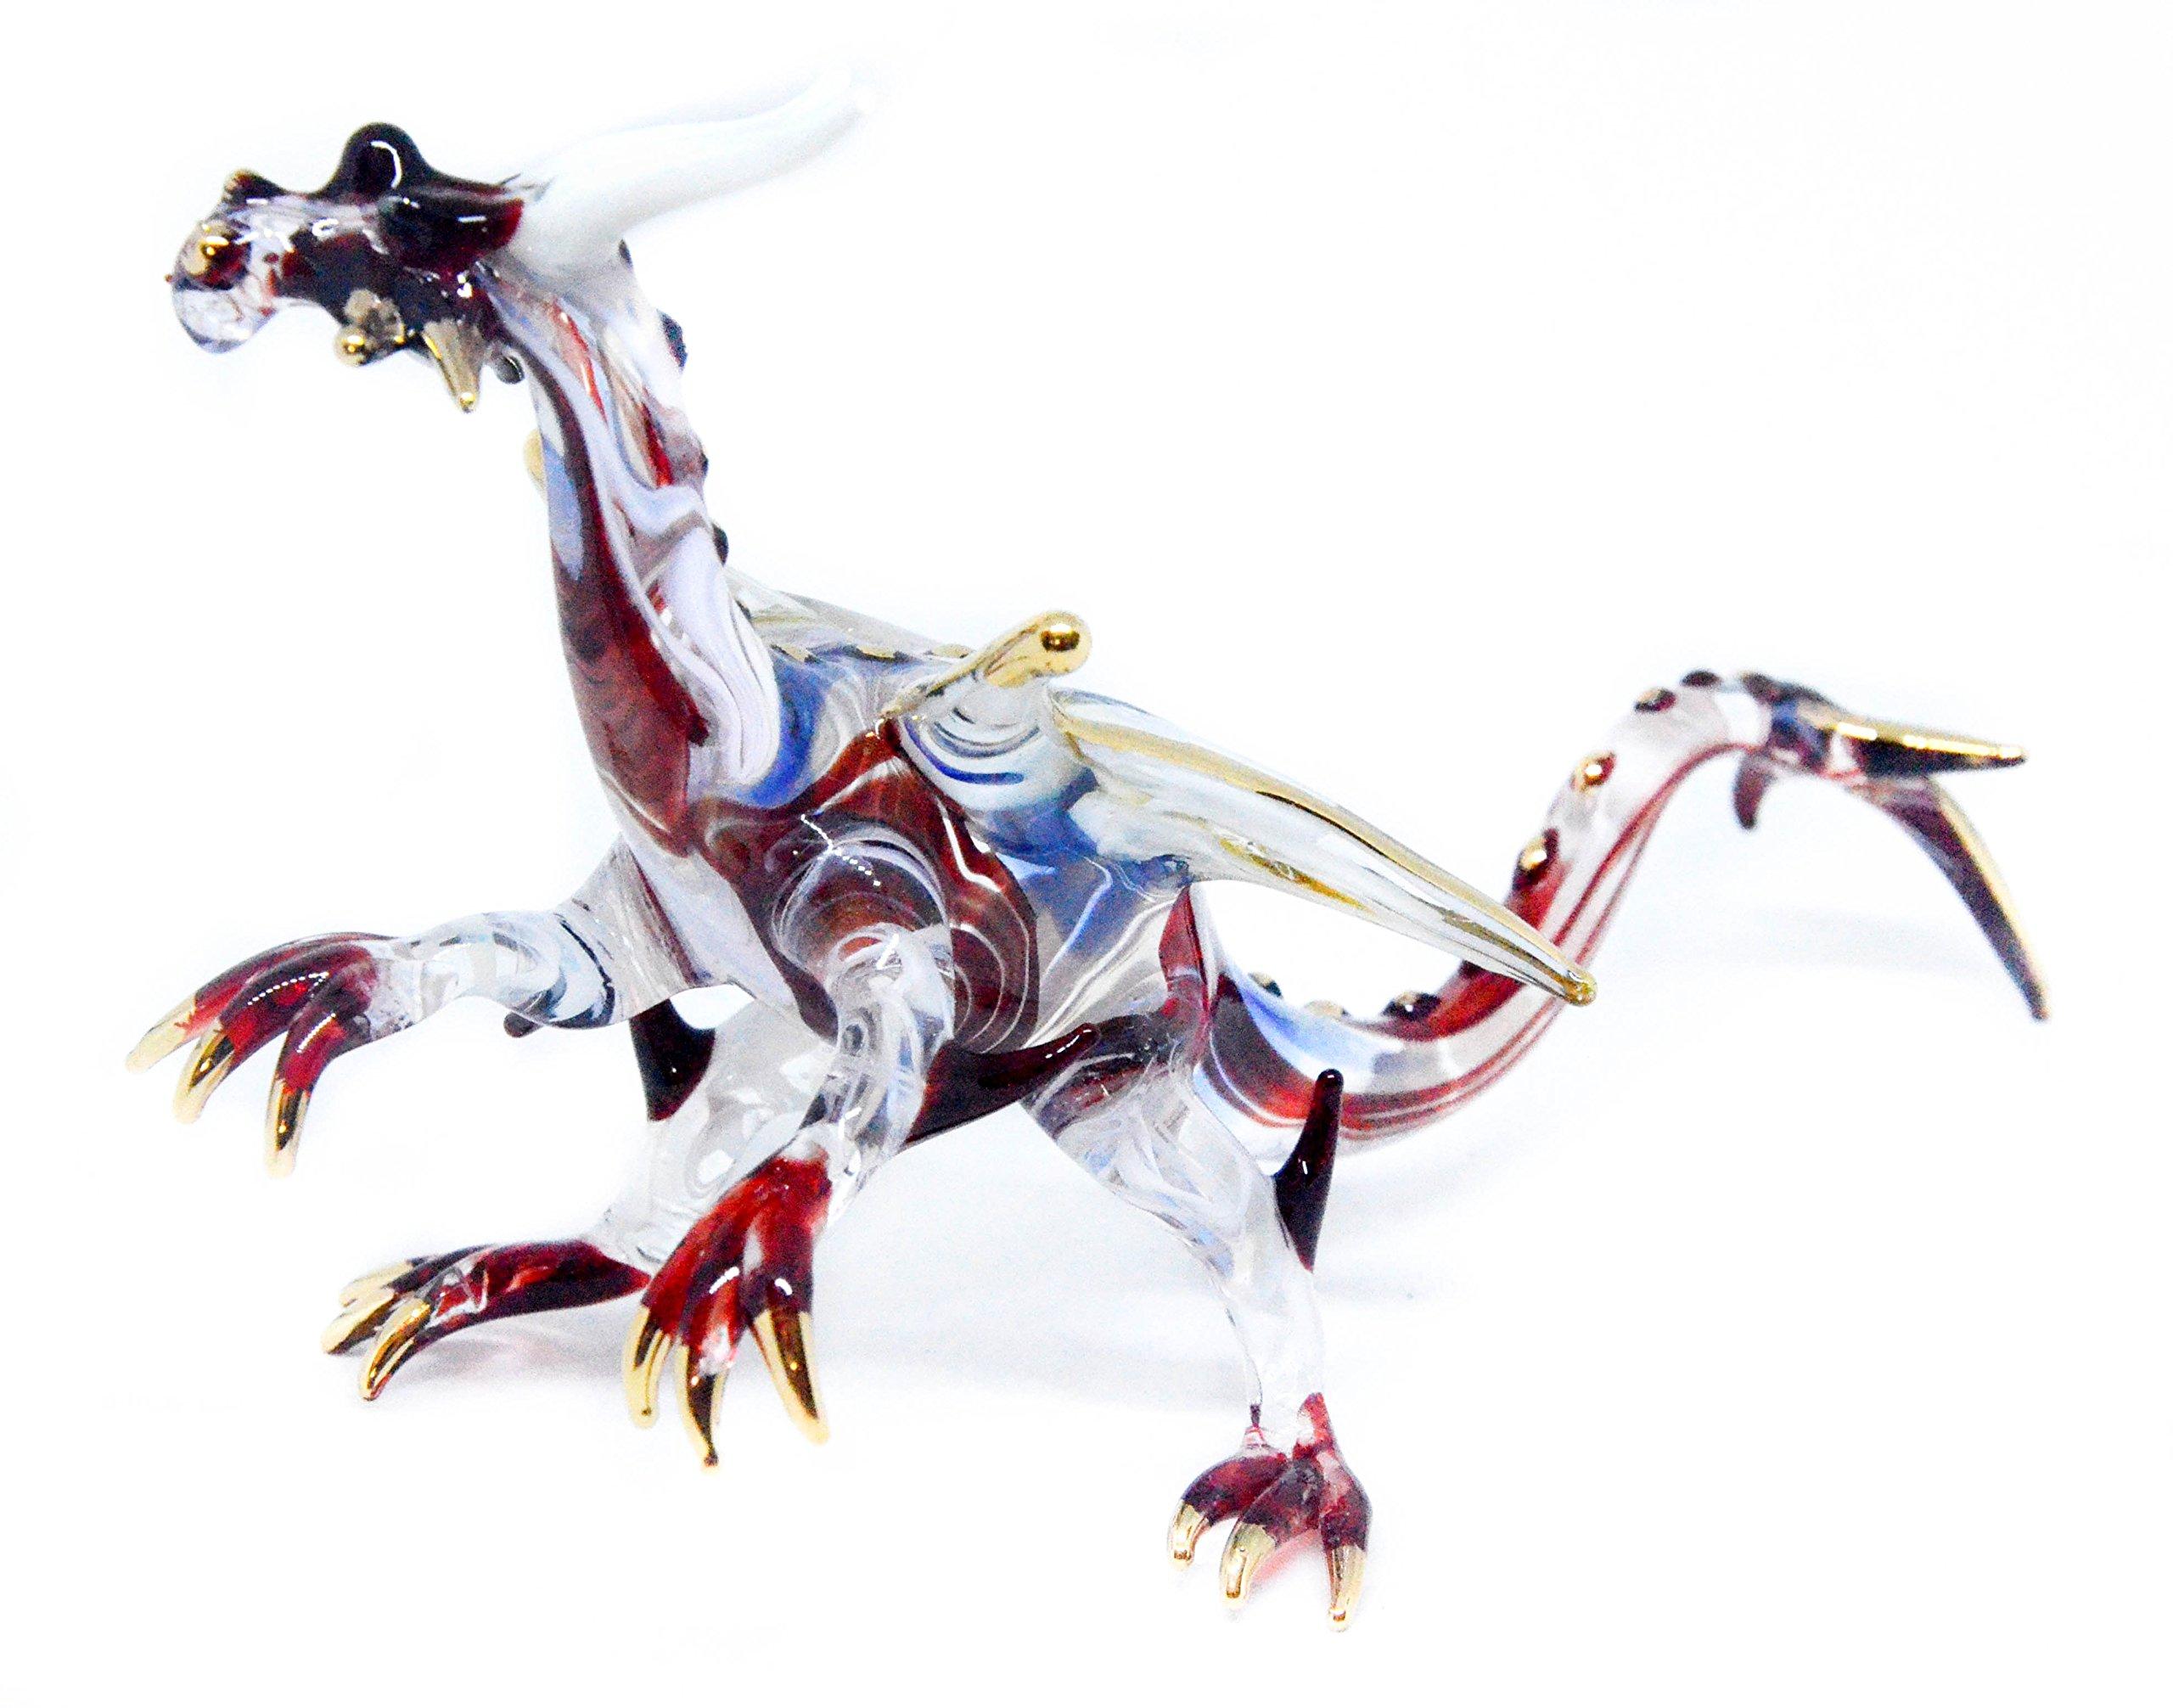 NaCraftTH Red Dragon Handicraft Figure Murano Glass Blowing Artwork Fantasy Animal Figurines Home Decor Handmade Gifts